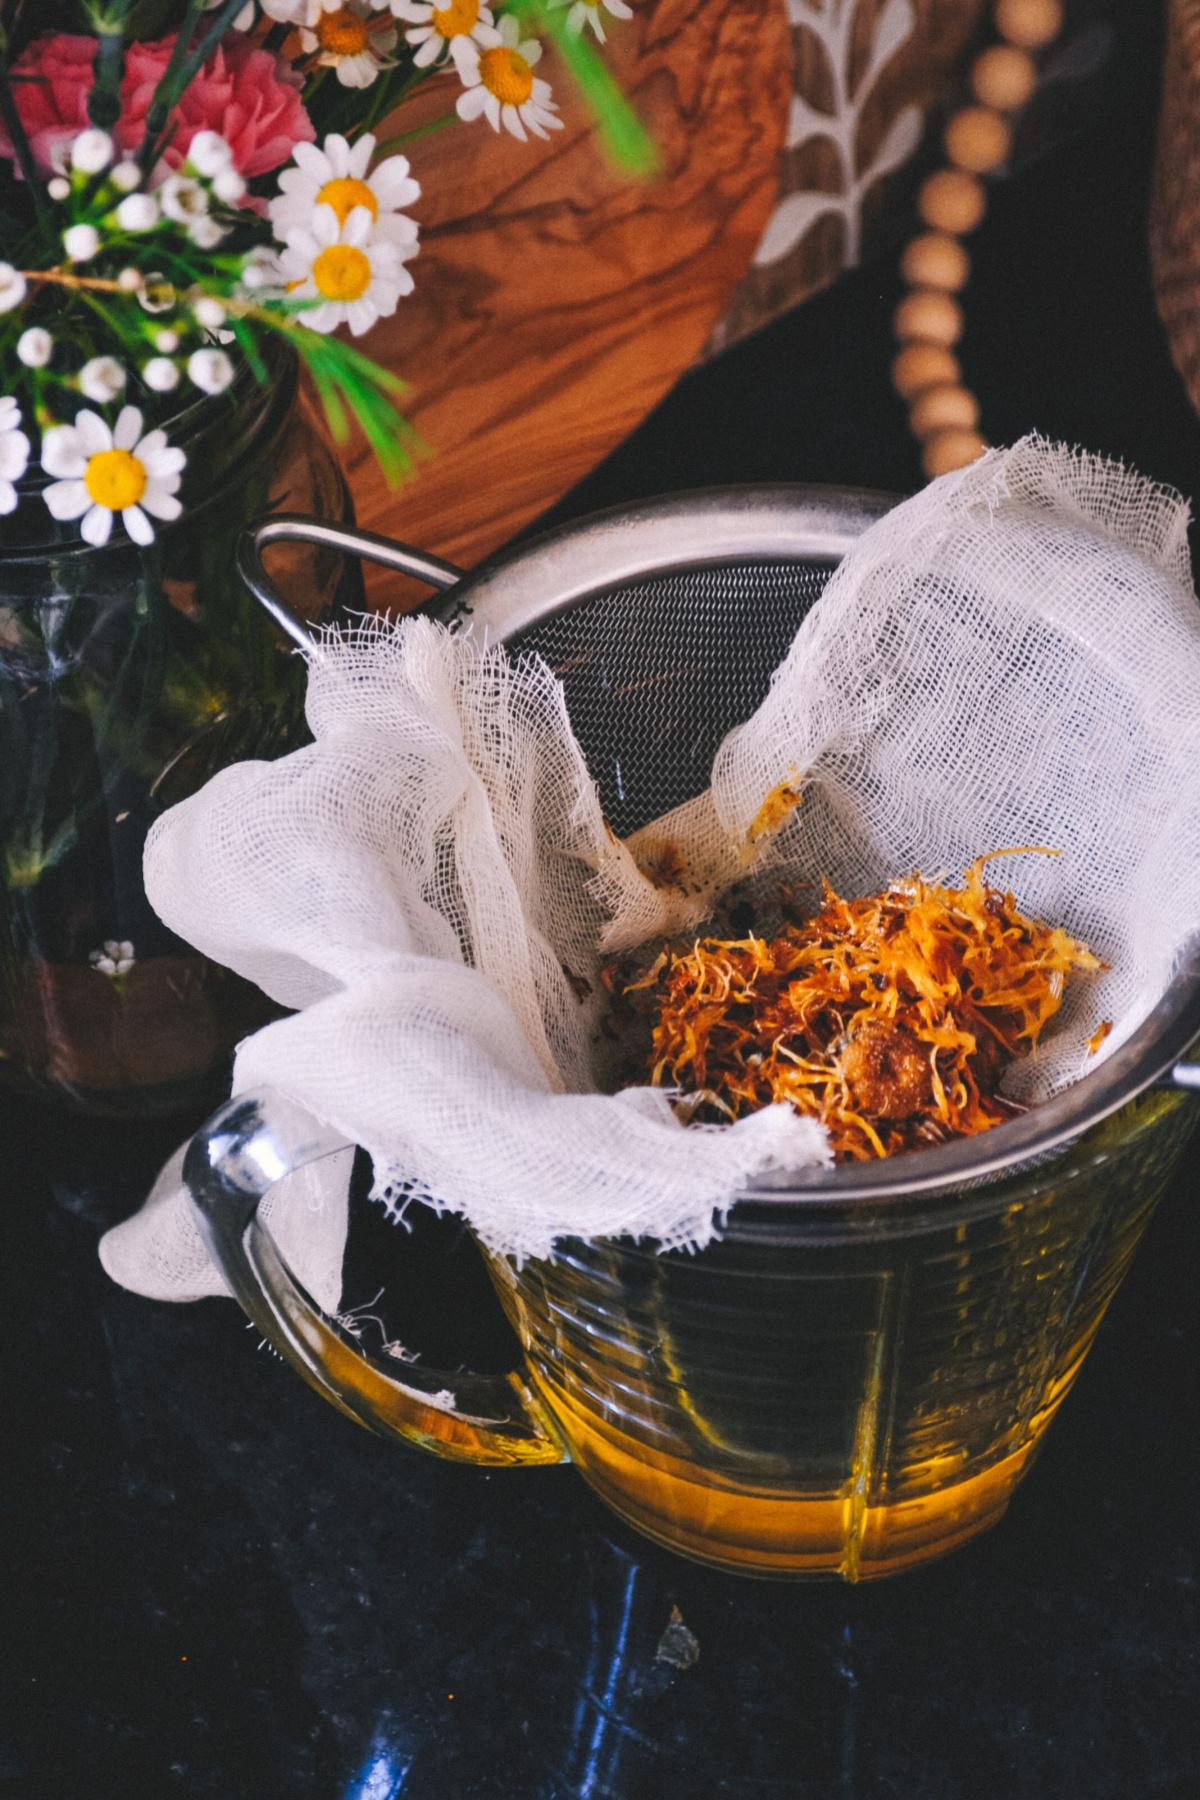 straining herbs through cheesecloth